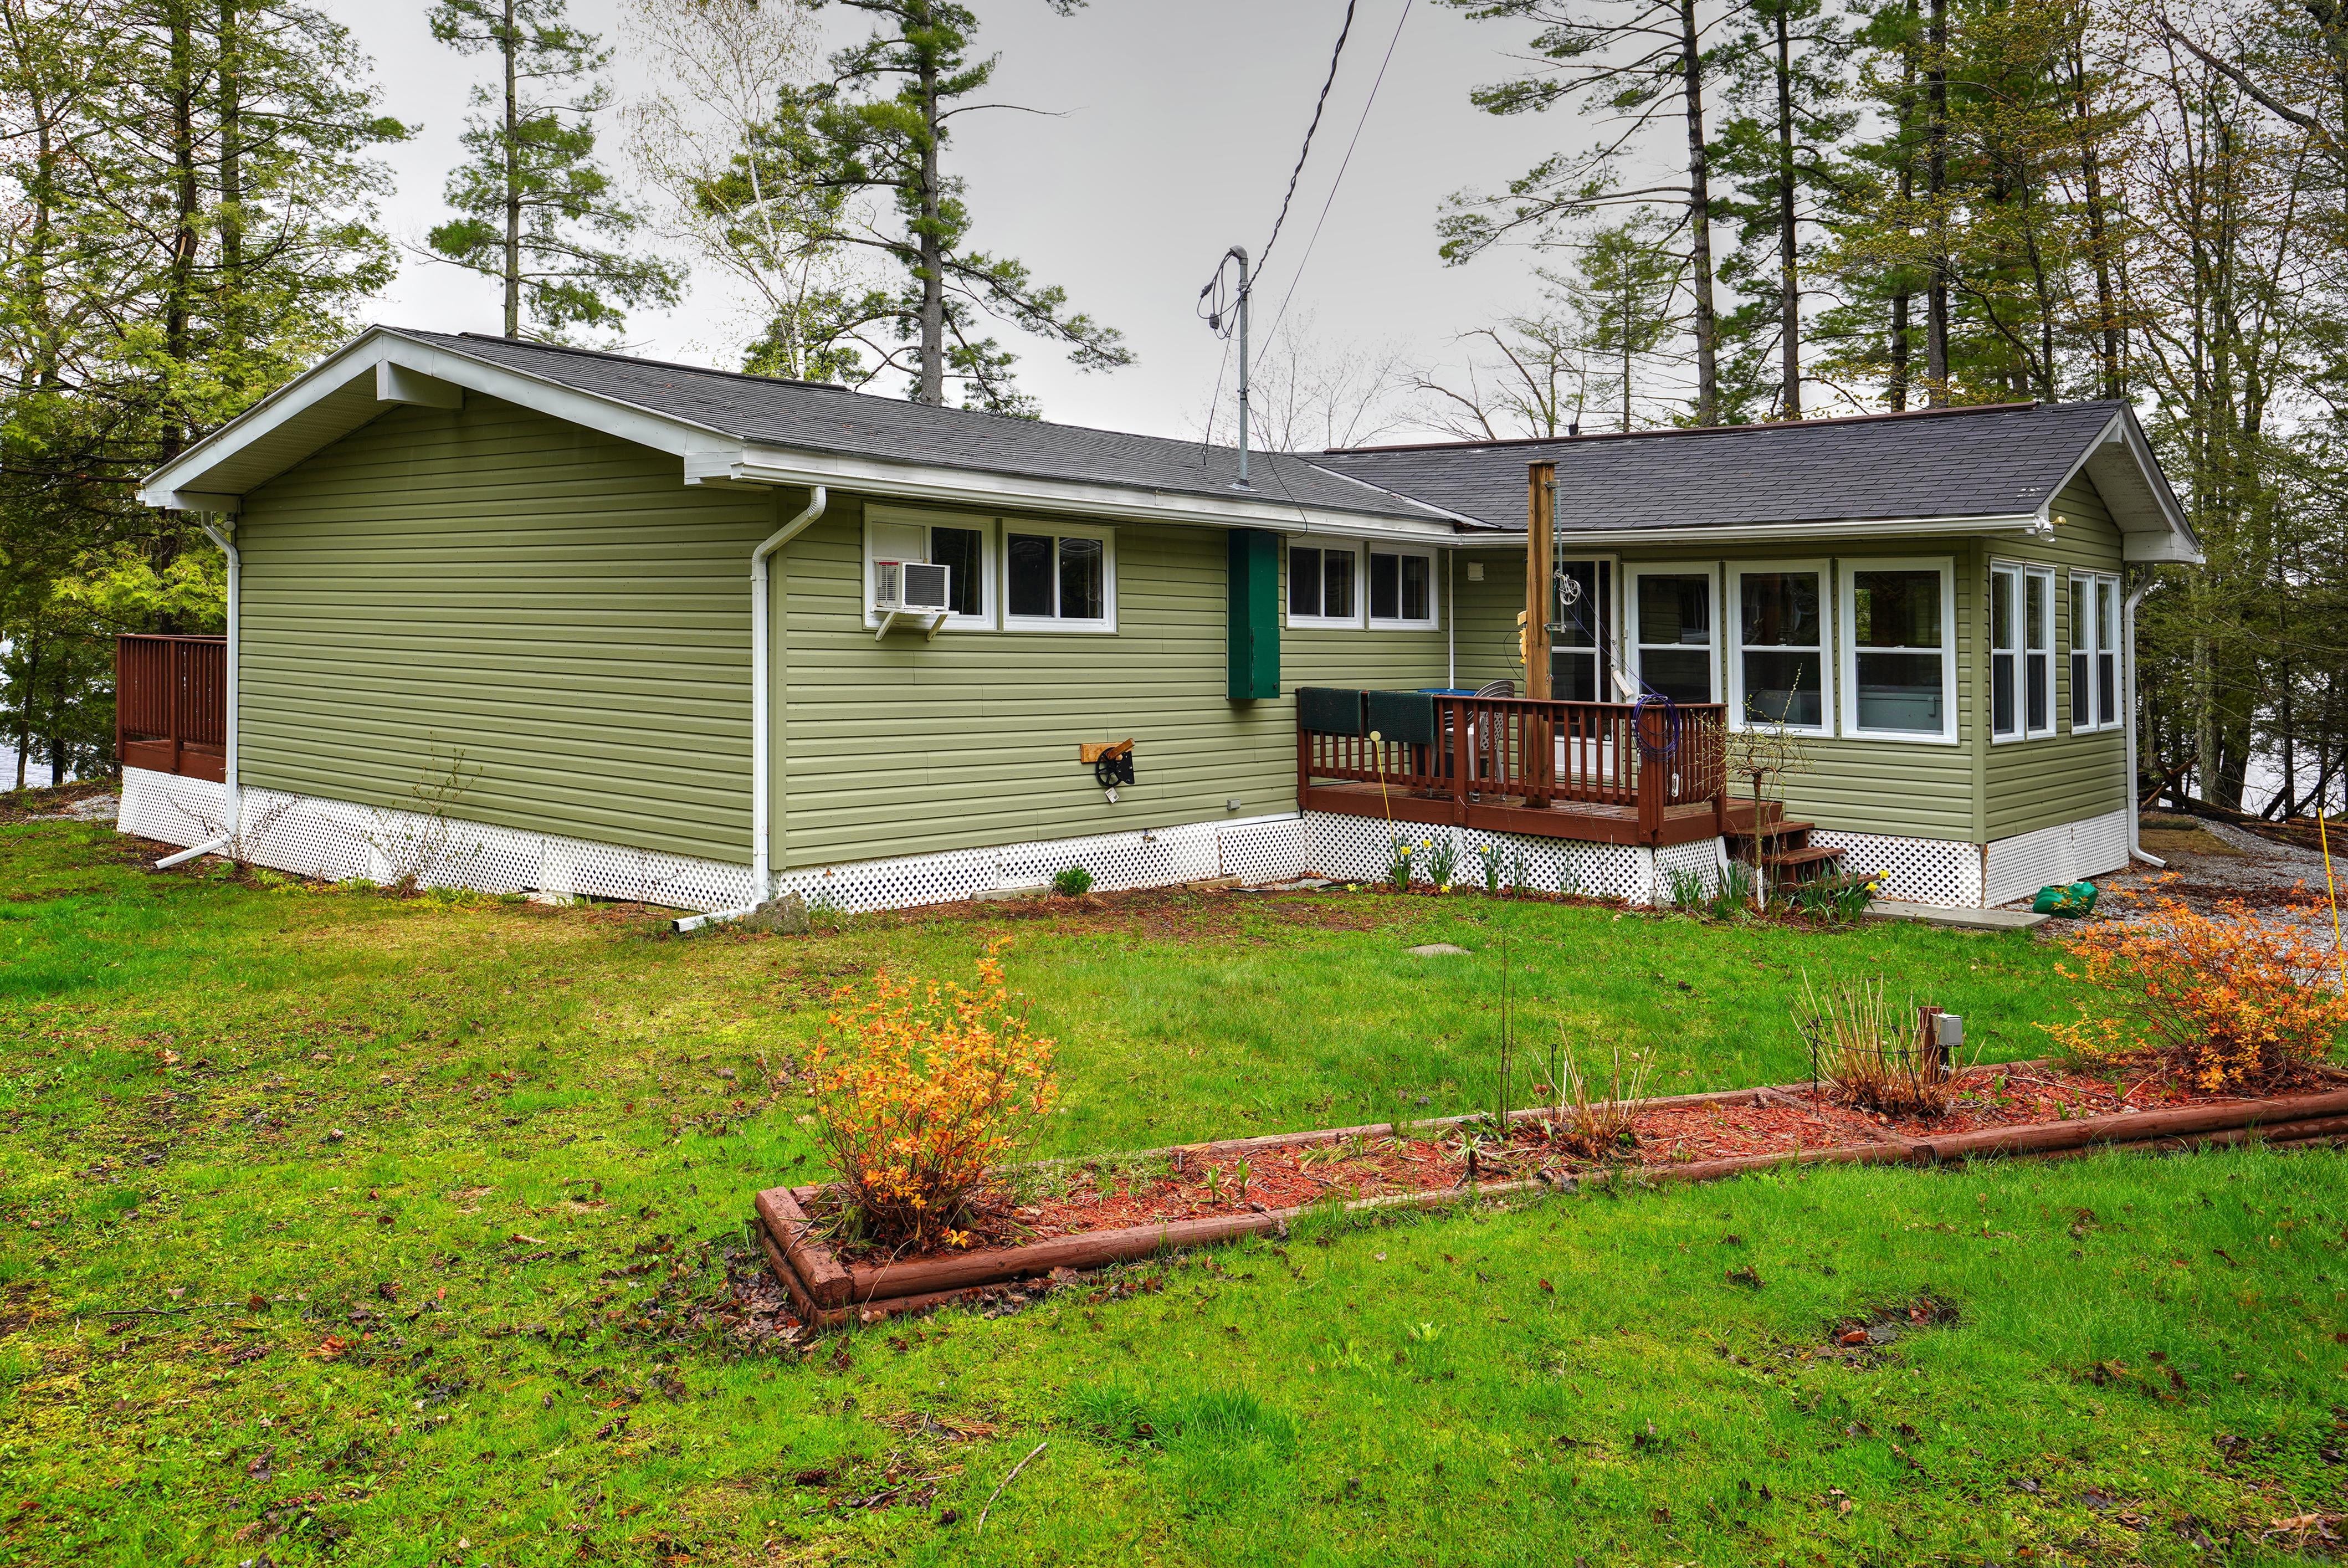 Bob's Lake, $675,000, 59 Neill Lane, Tichborne, Ontario